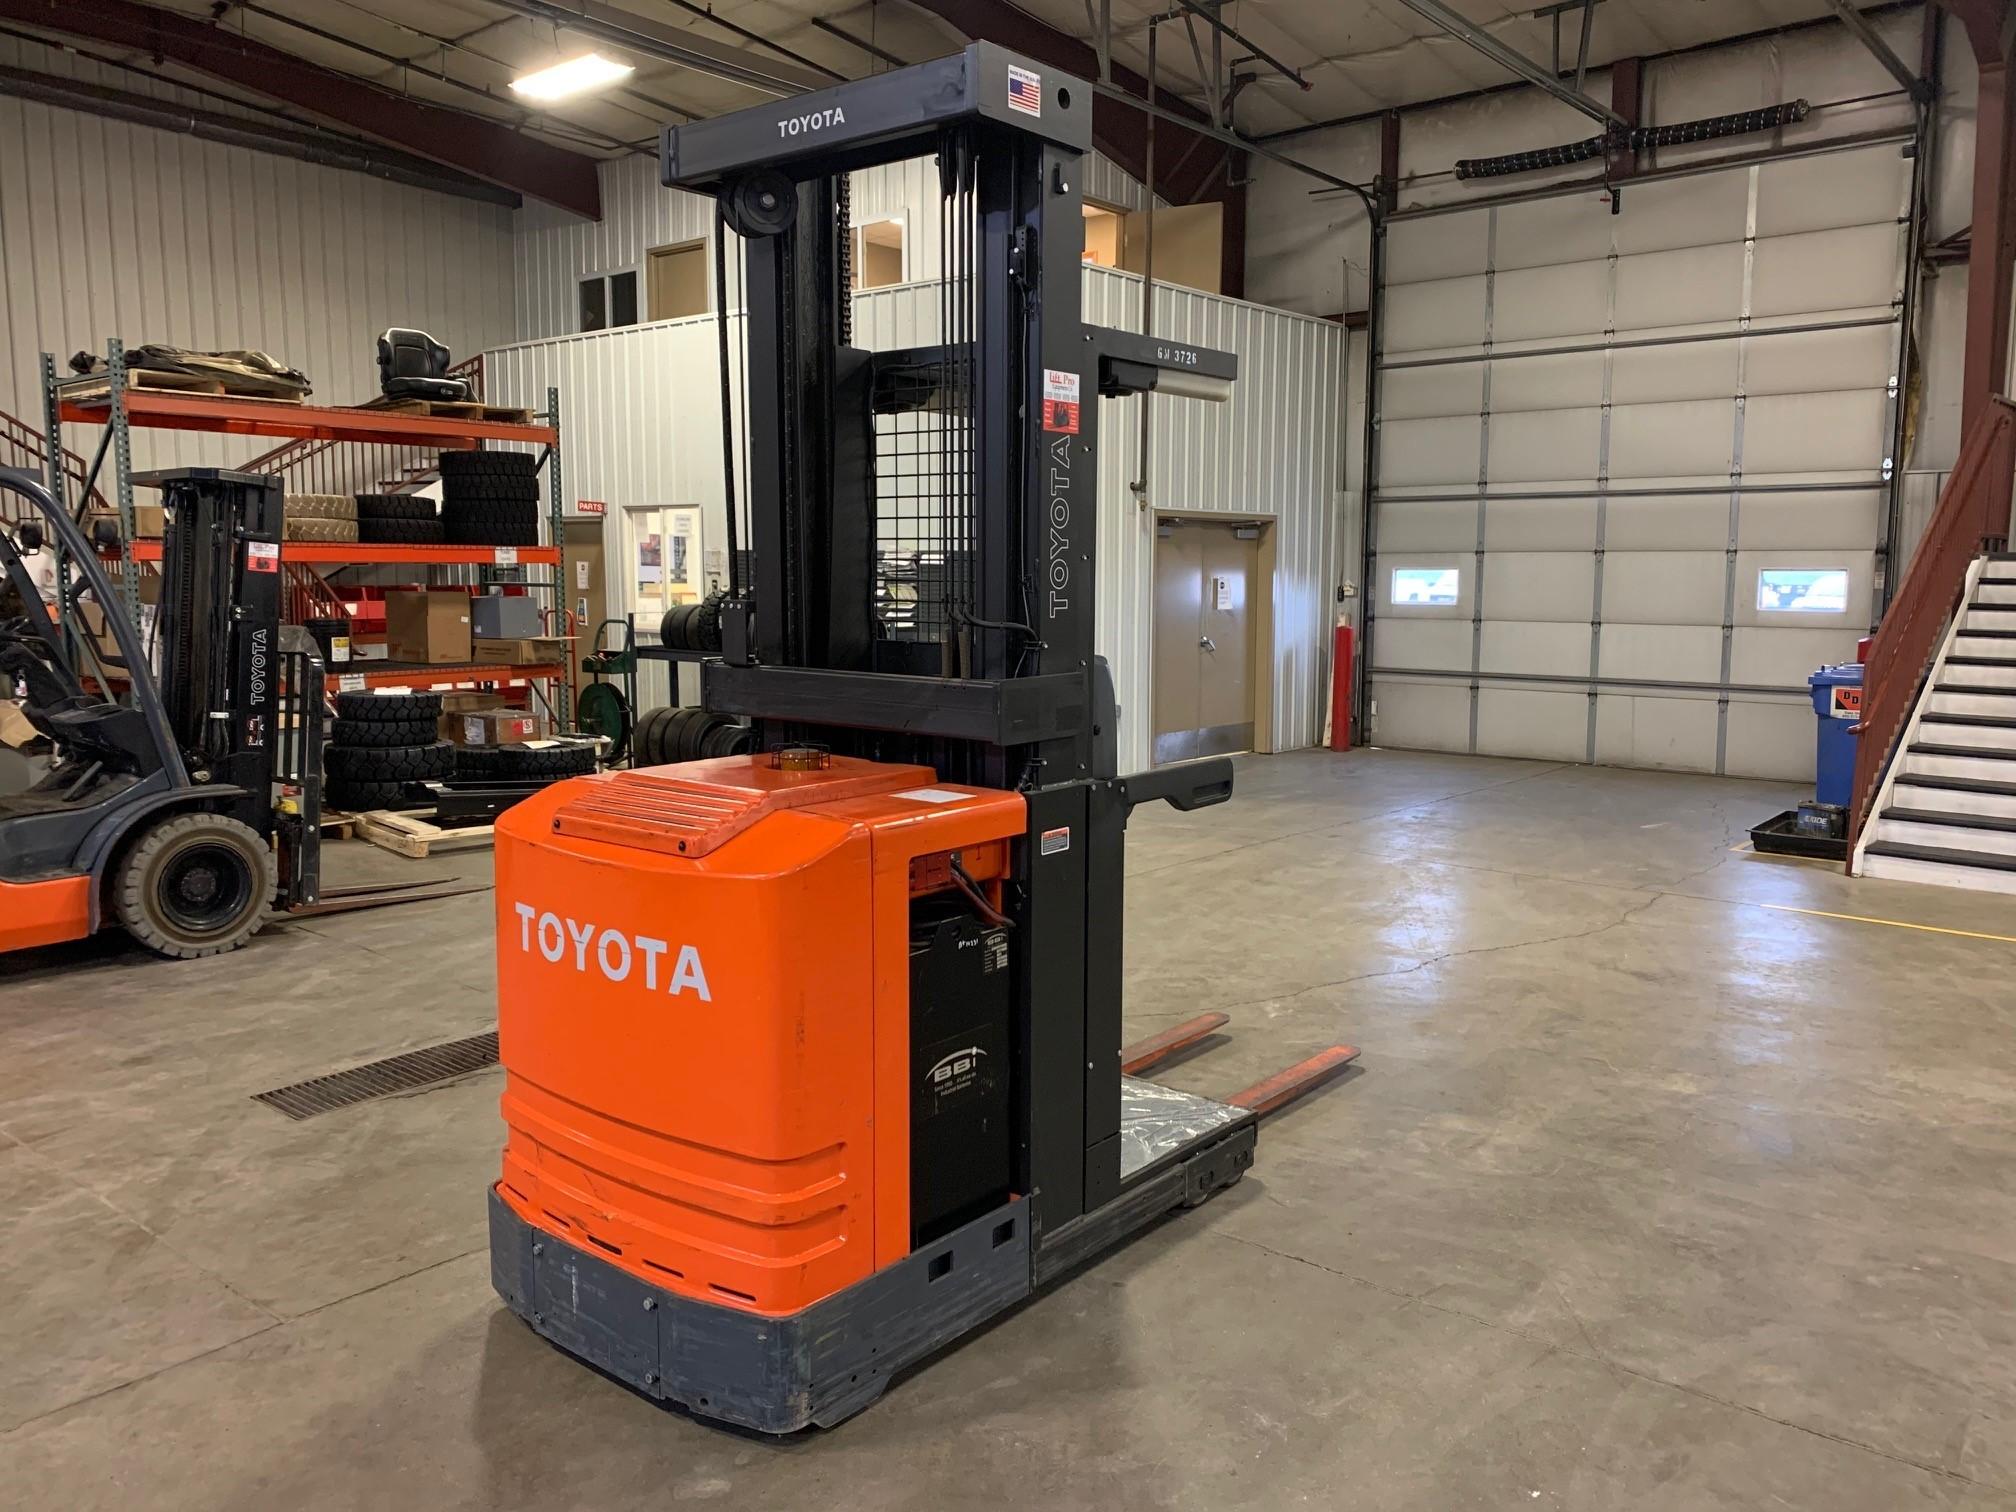 Used, 2014, Toyota Industrial Equipment, 6BPU15, Forklifts / Lift Trucks